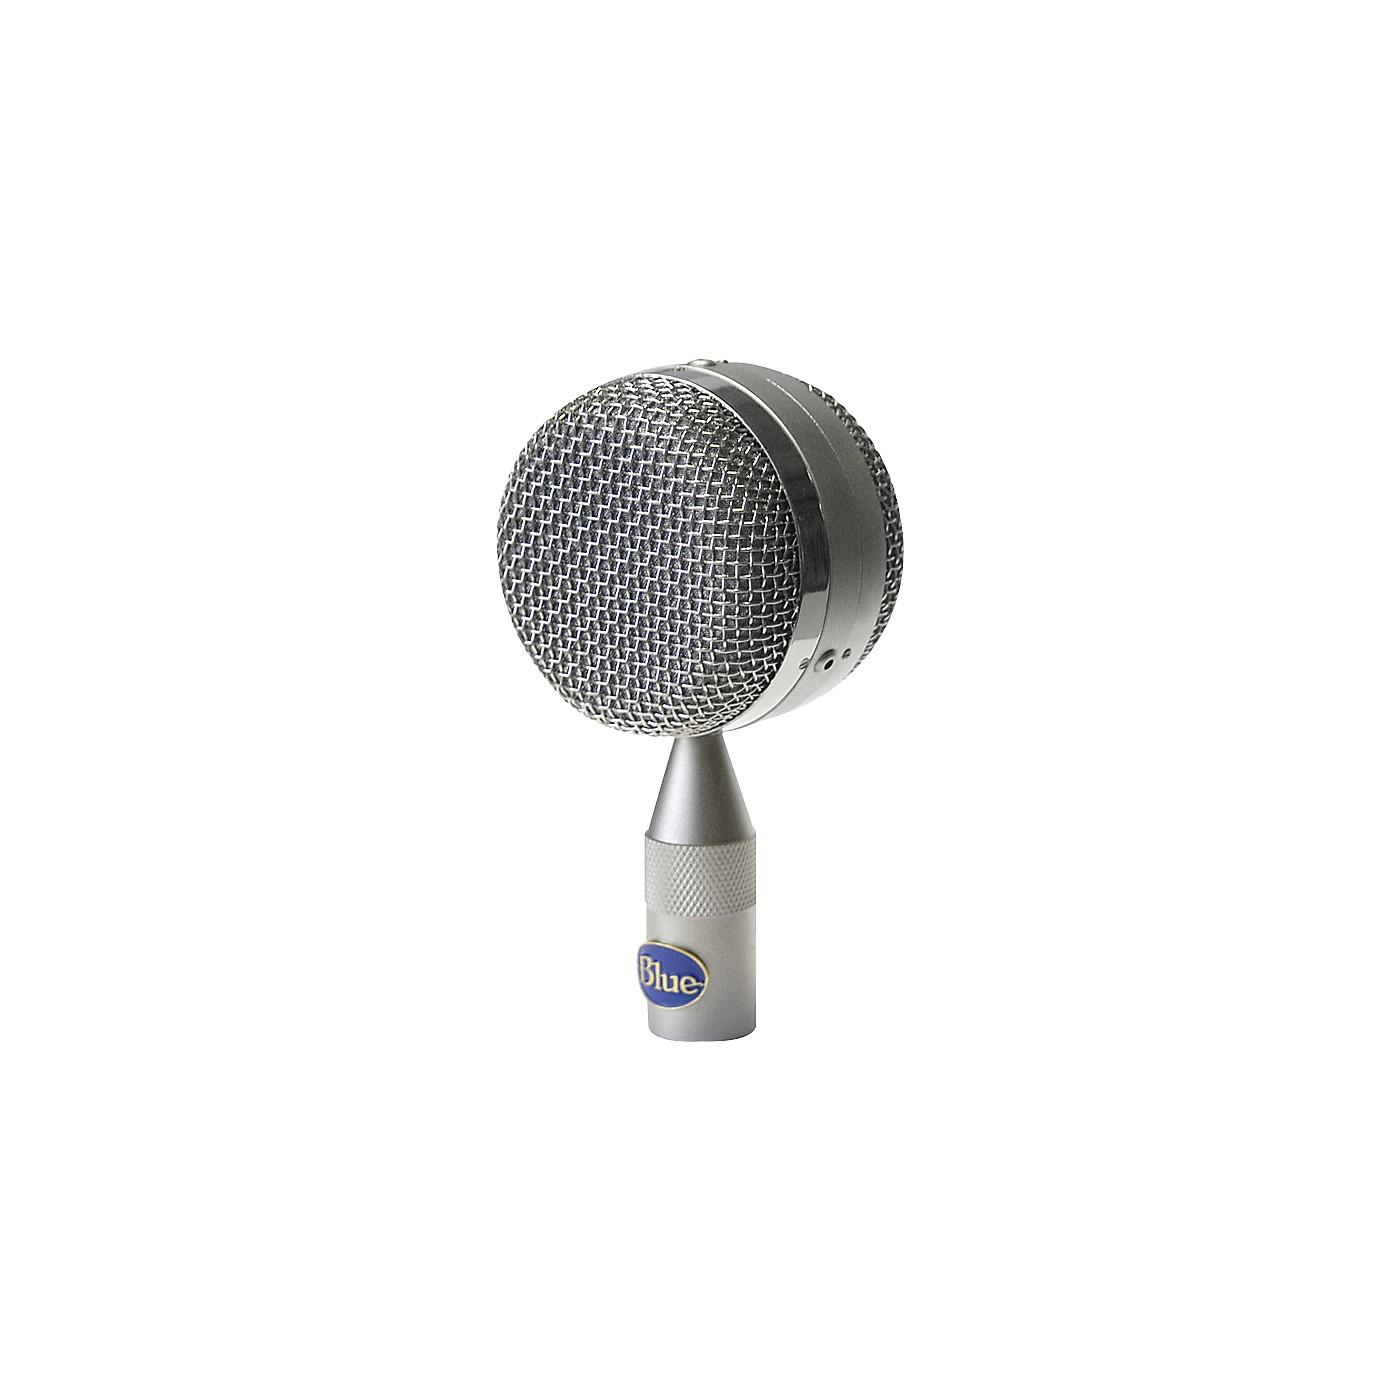 Blue B6 Cardioid Dual Backplate Bottle Cap thumbnail